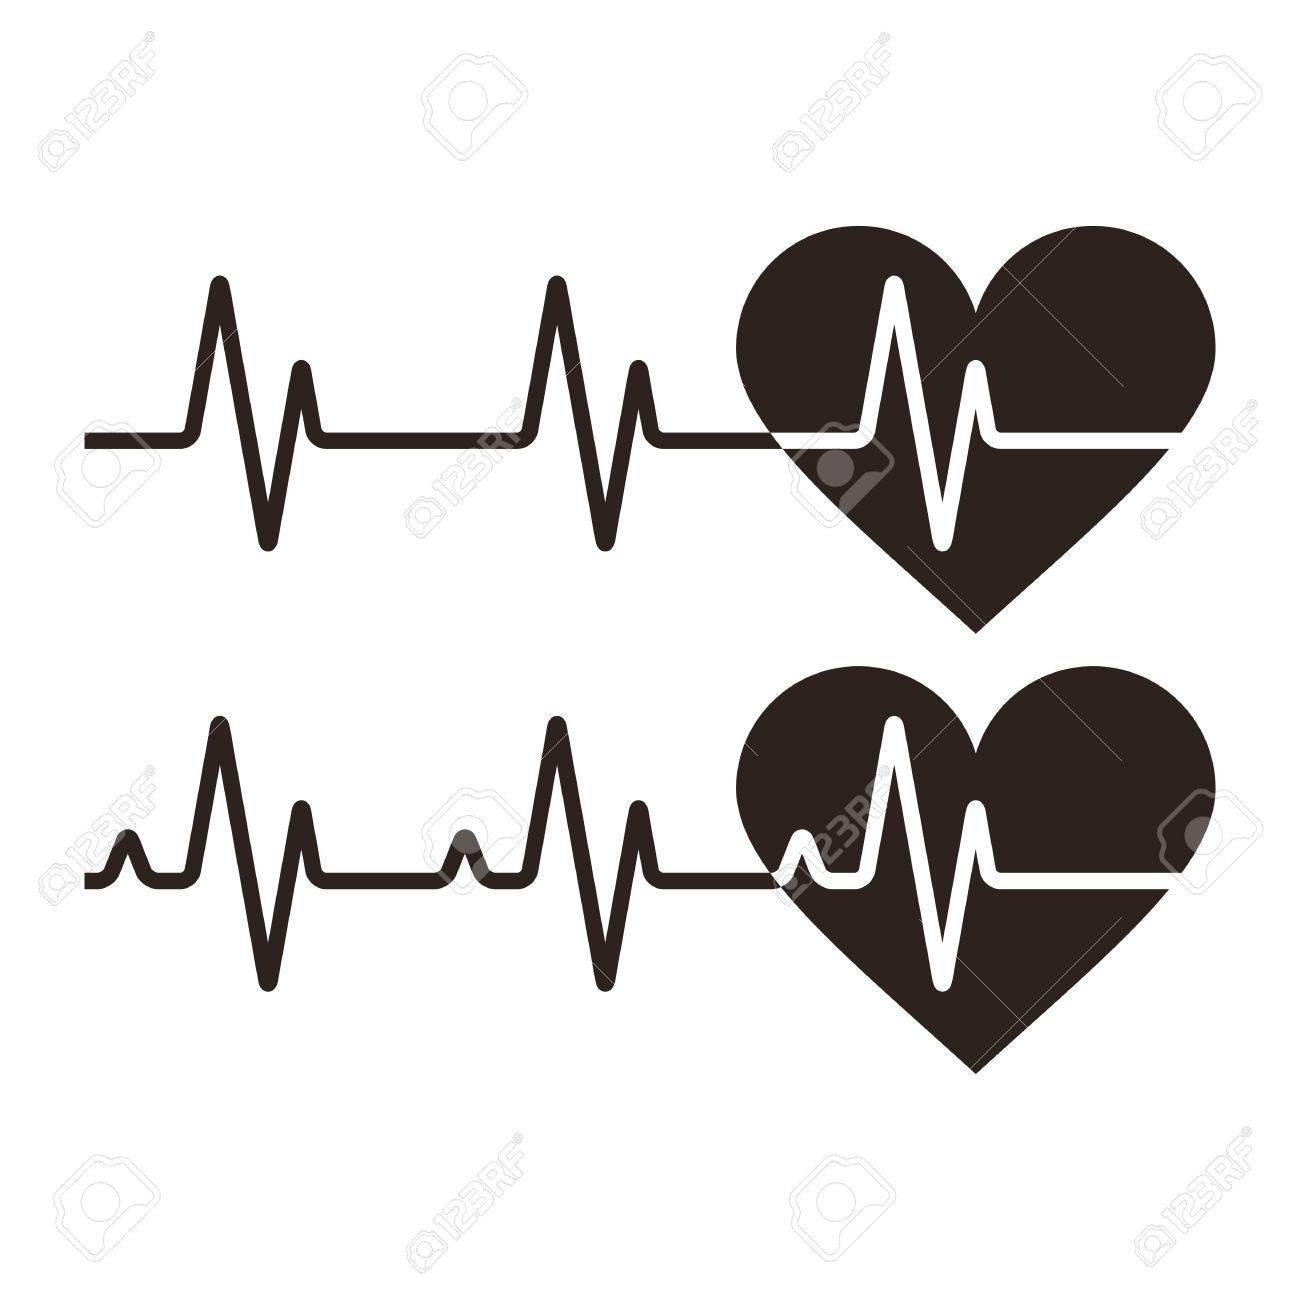 Heartbeat icons. Electrocardiogram, ecg or ekg isolated on white background - 40041184